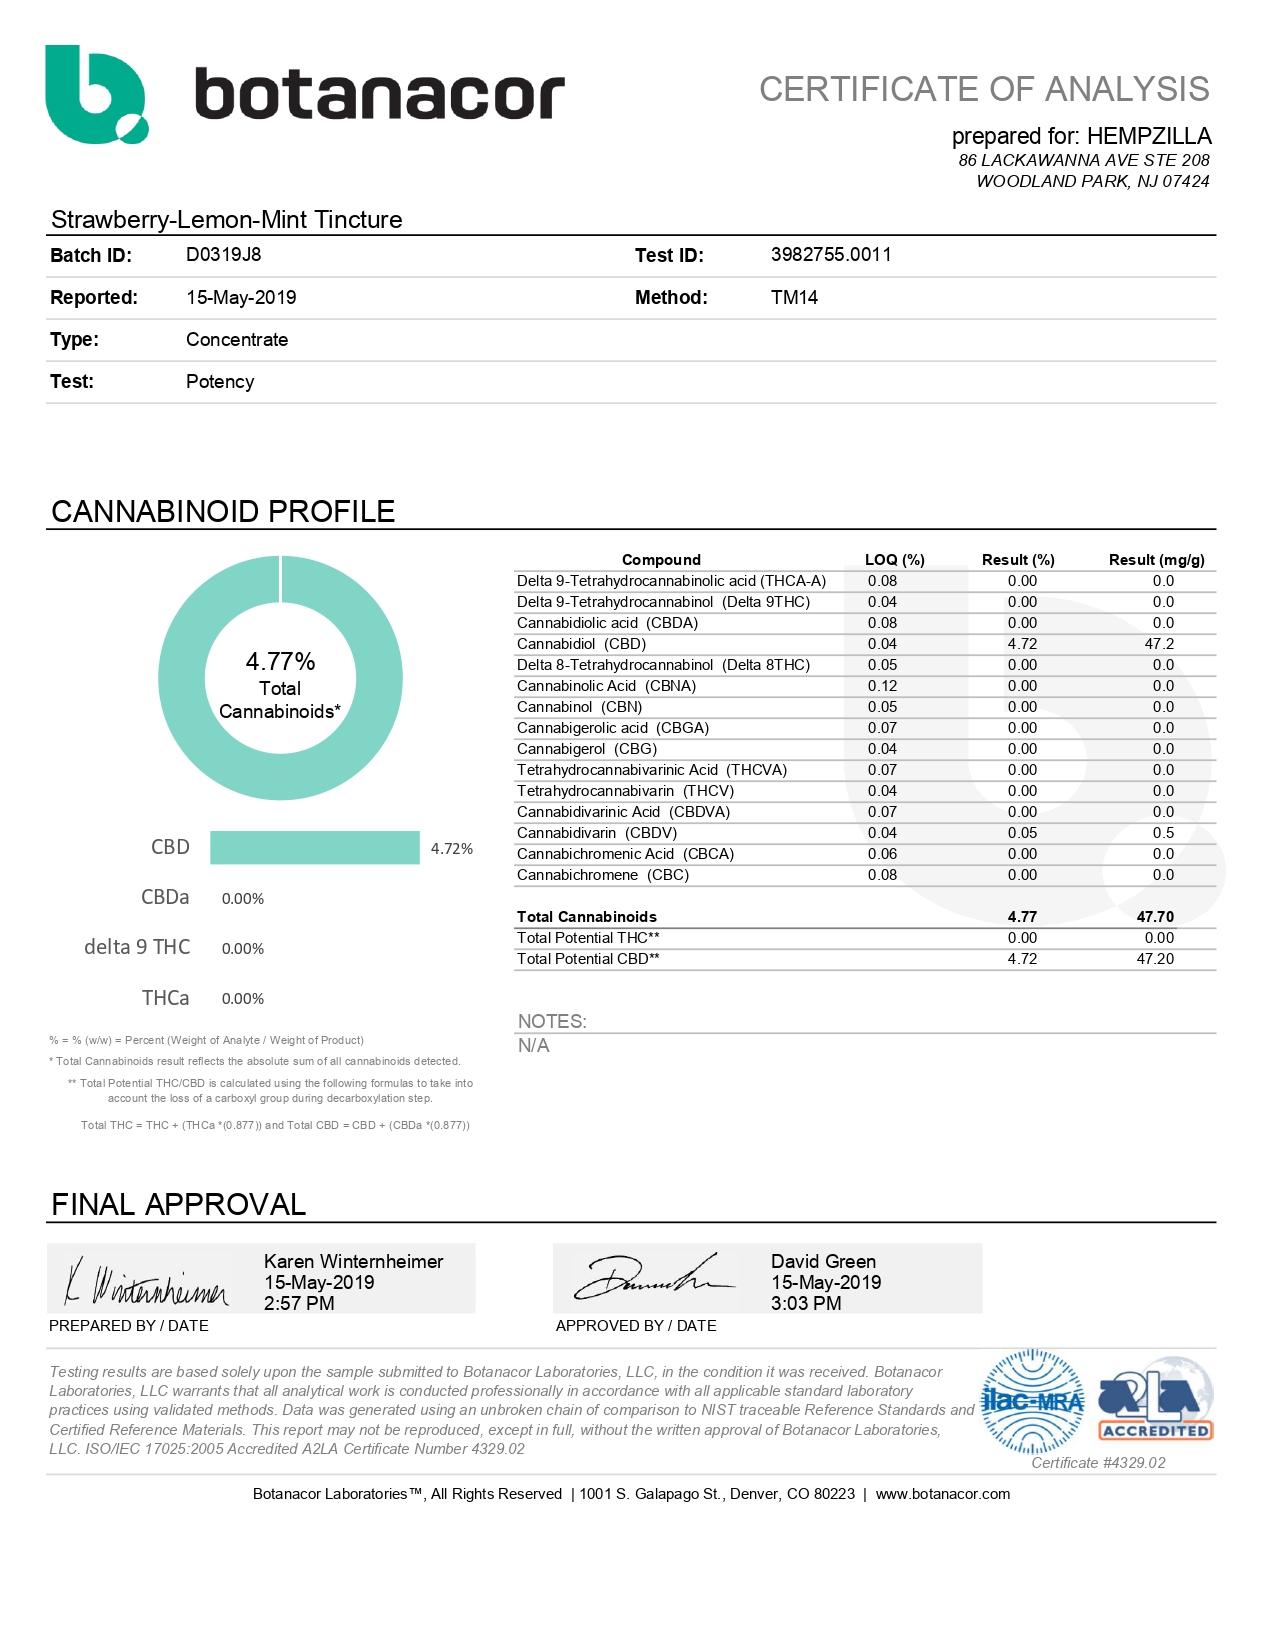 Hempzilla CBD Tincture Lemon Berry Mint 150mg Lab Report